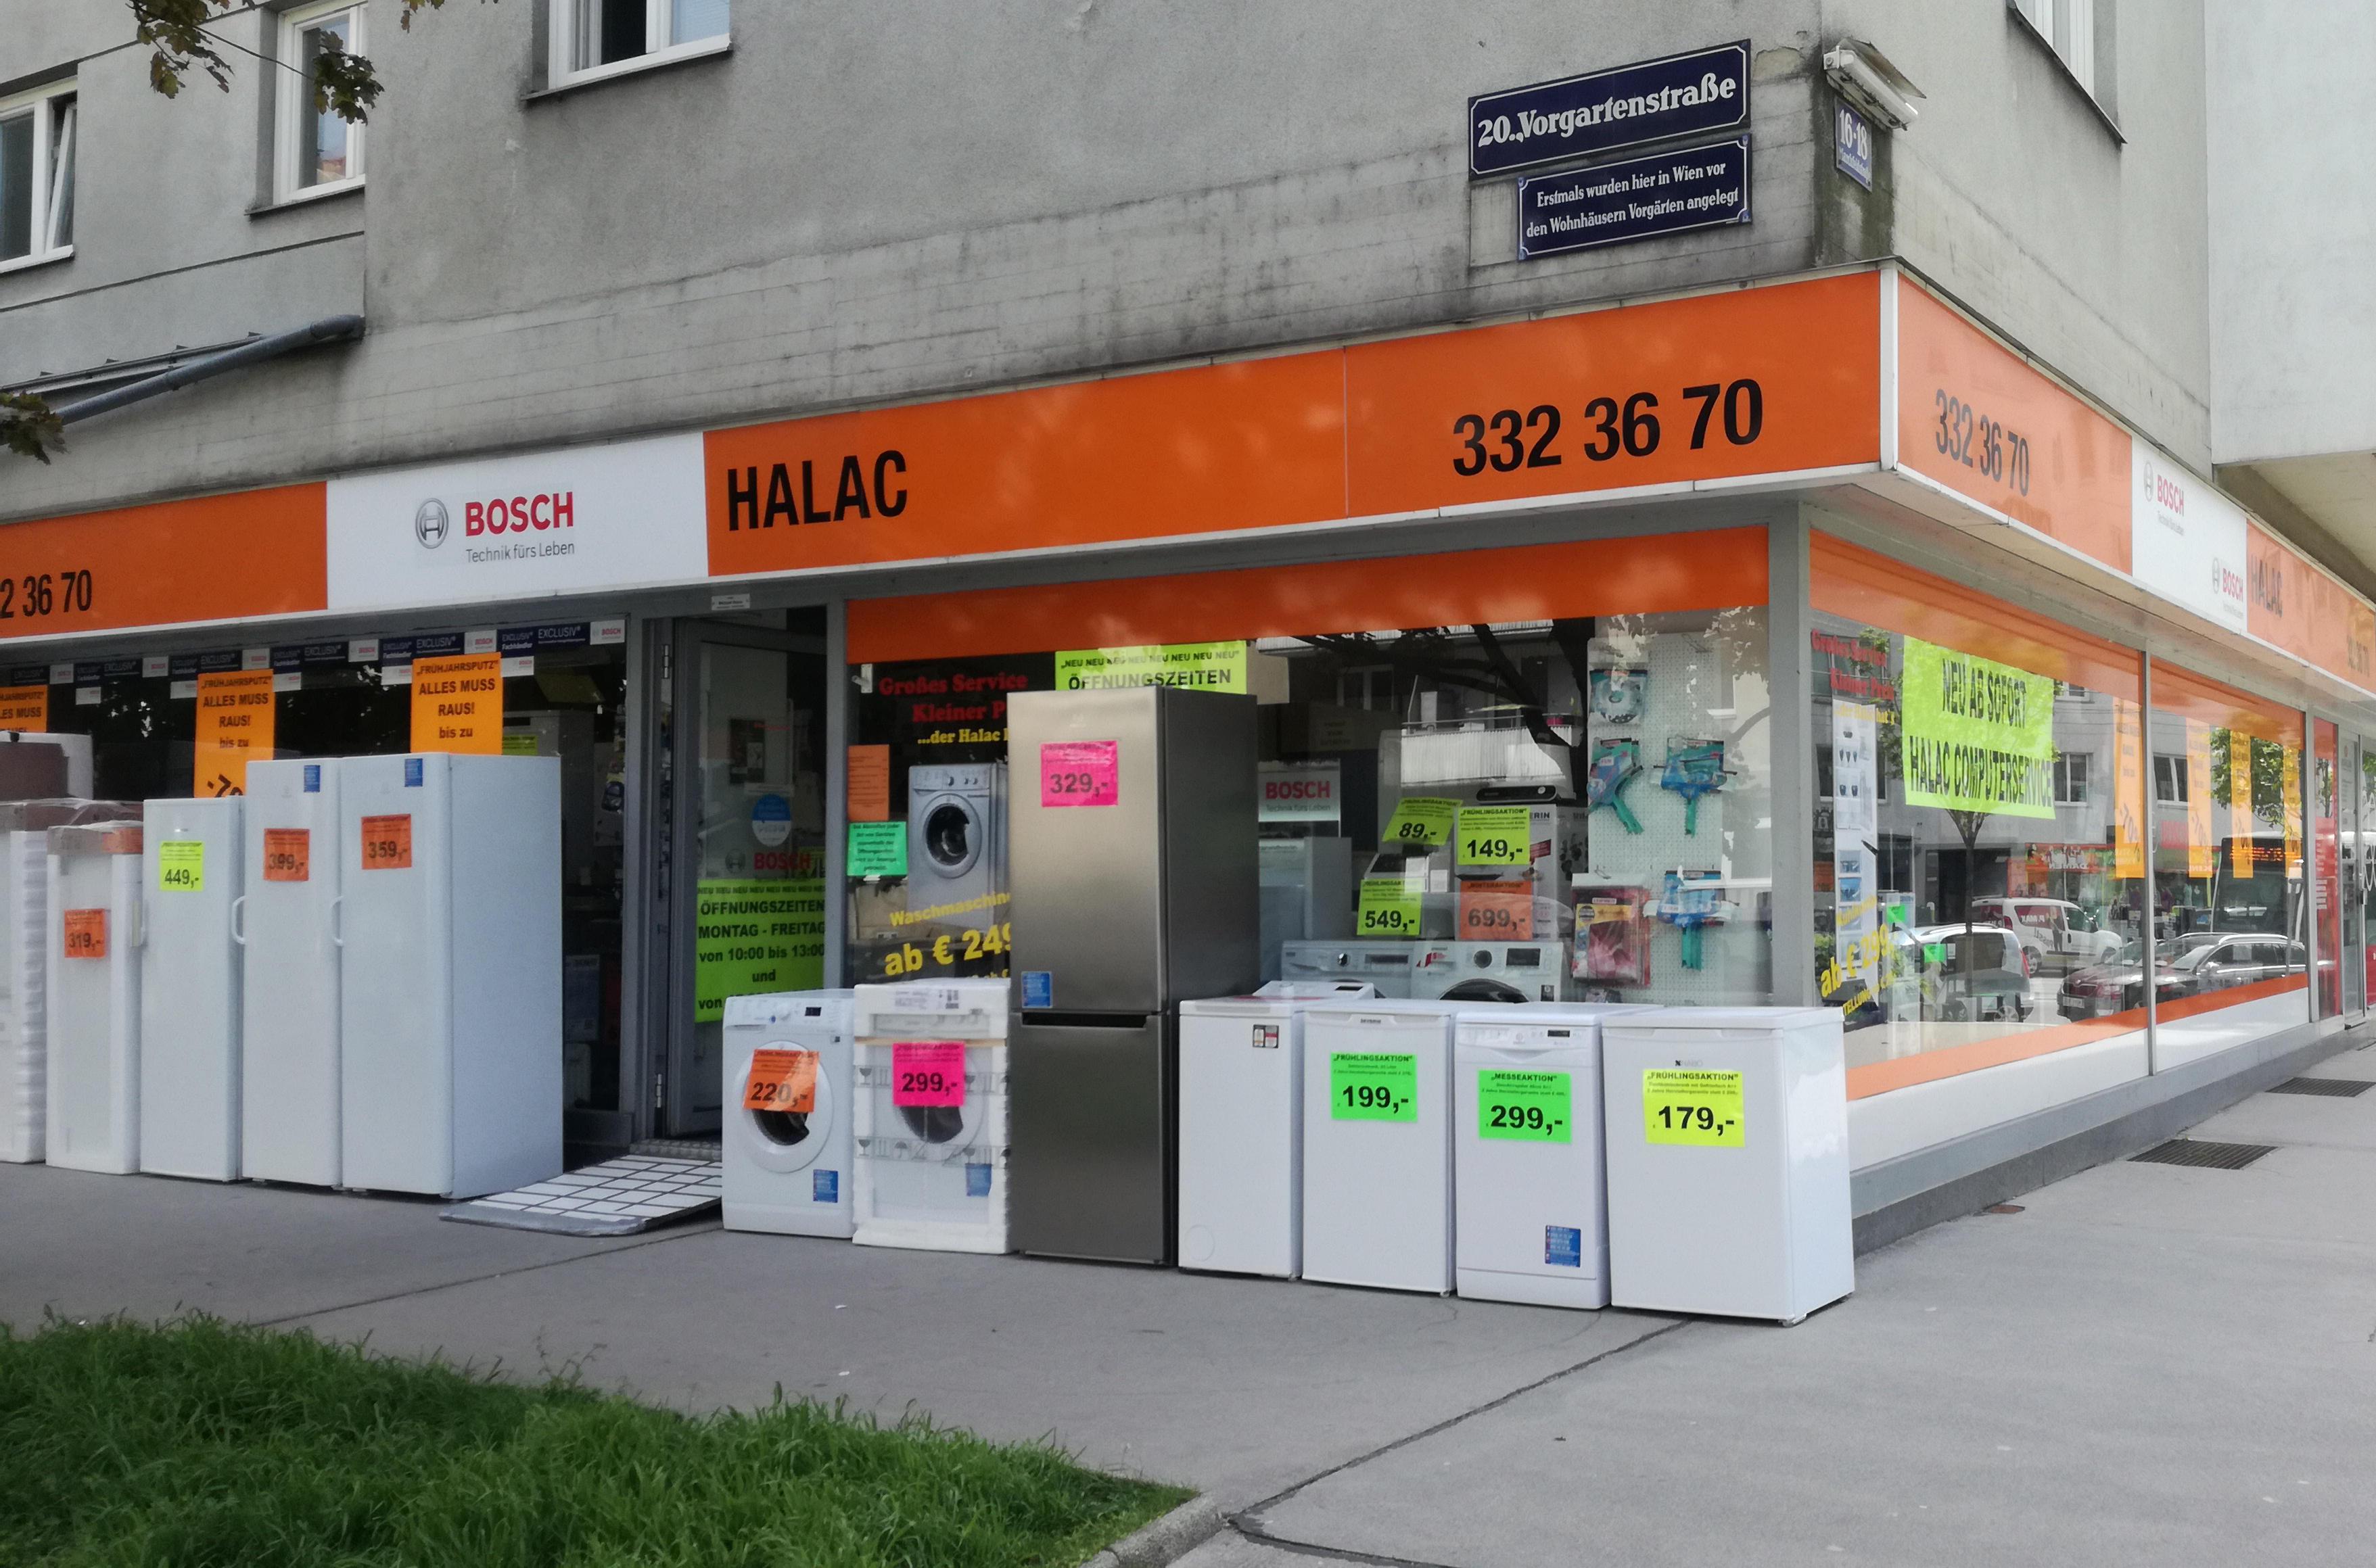 halac haushaltsger te computer service elektrizit t elektronik bedarfsartikel kleinhandel. Black Bedroom Furniture Sets. Home Design Ideas